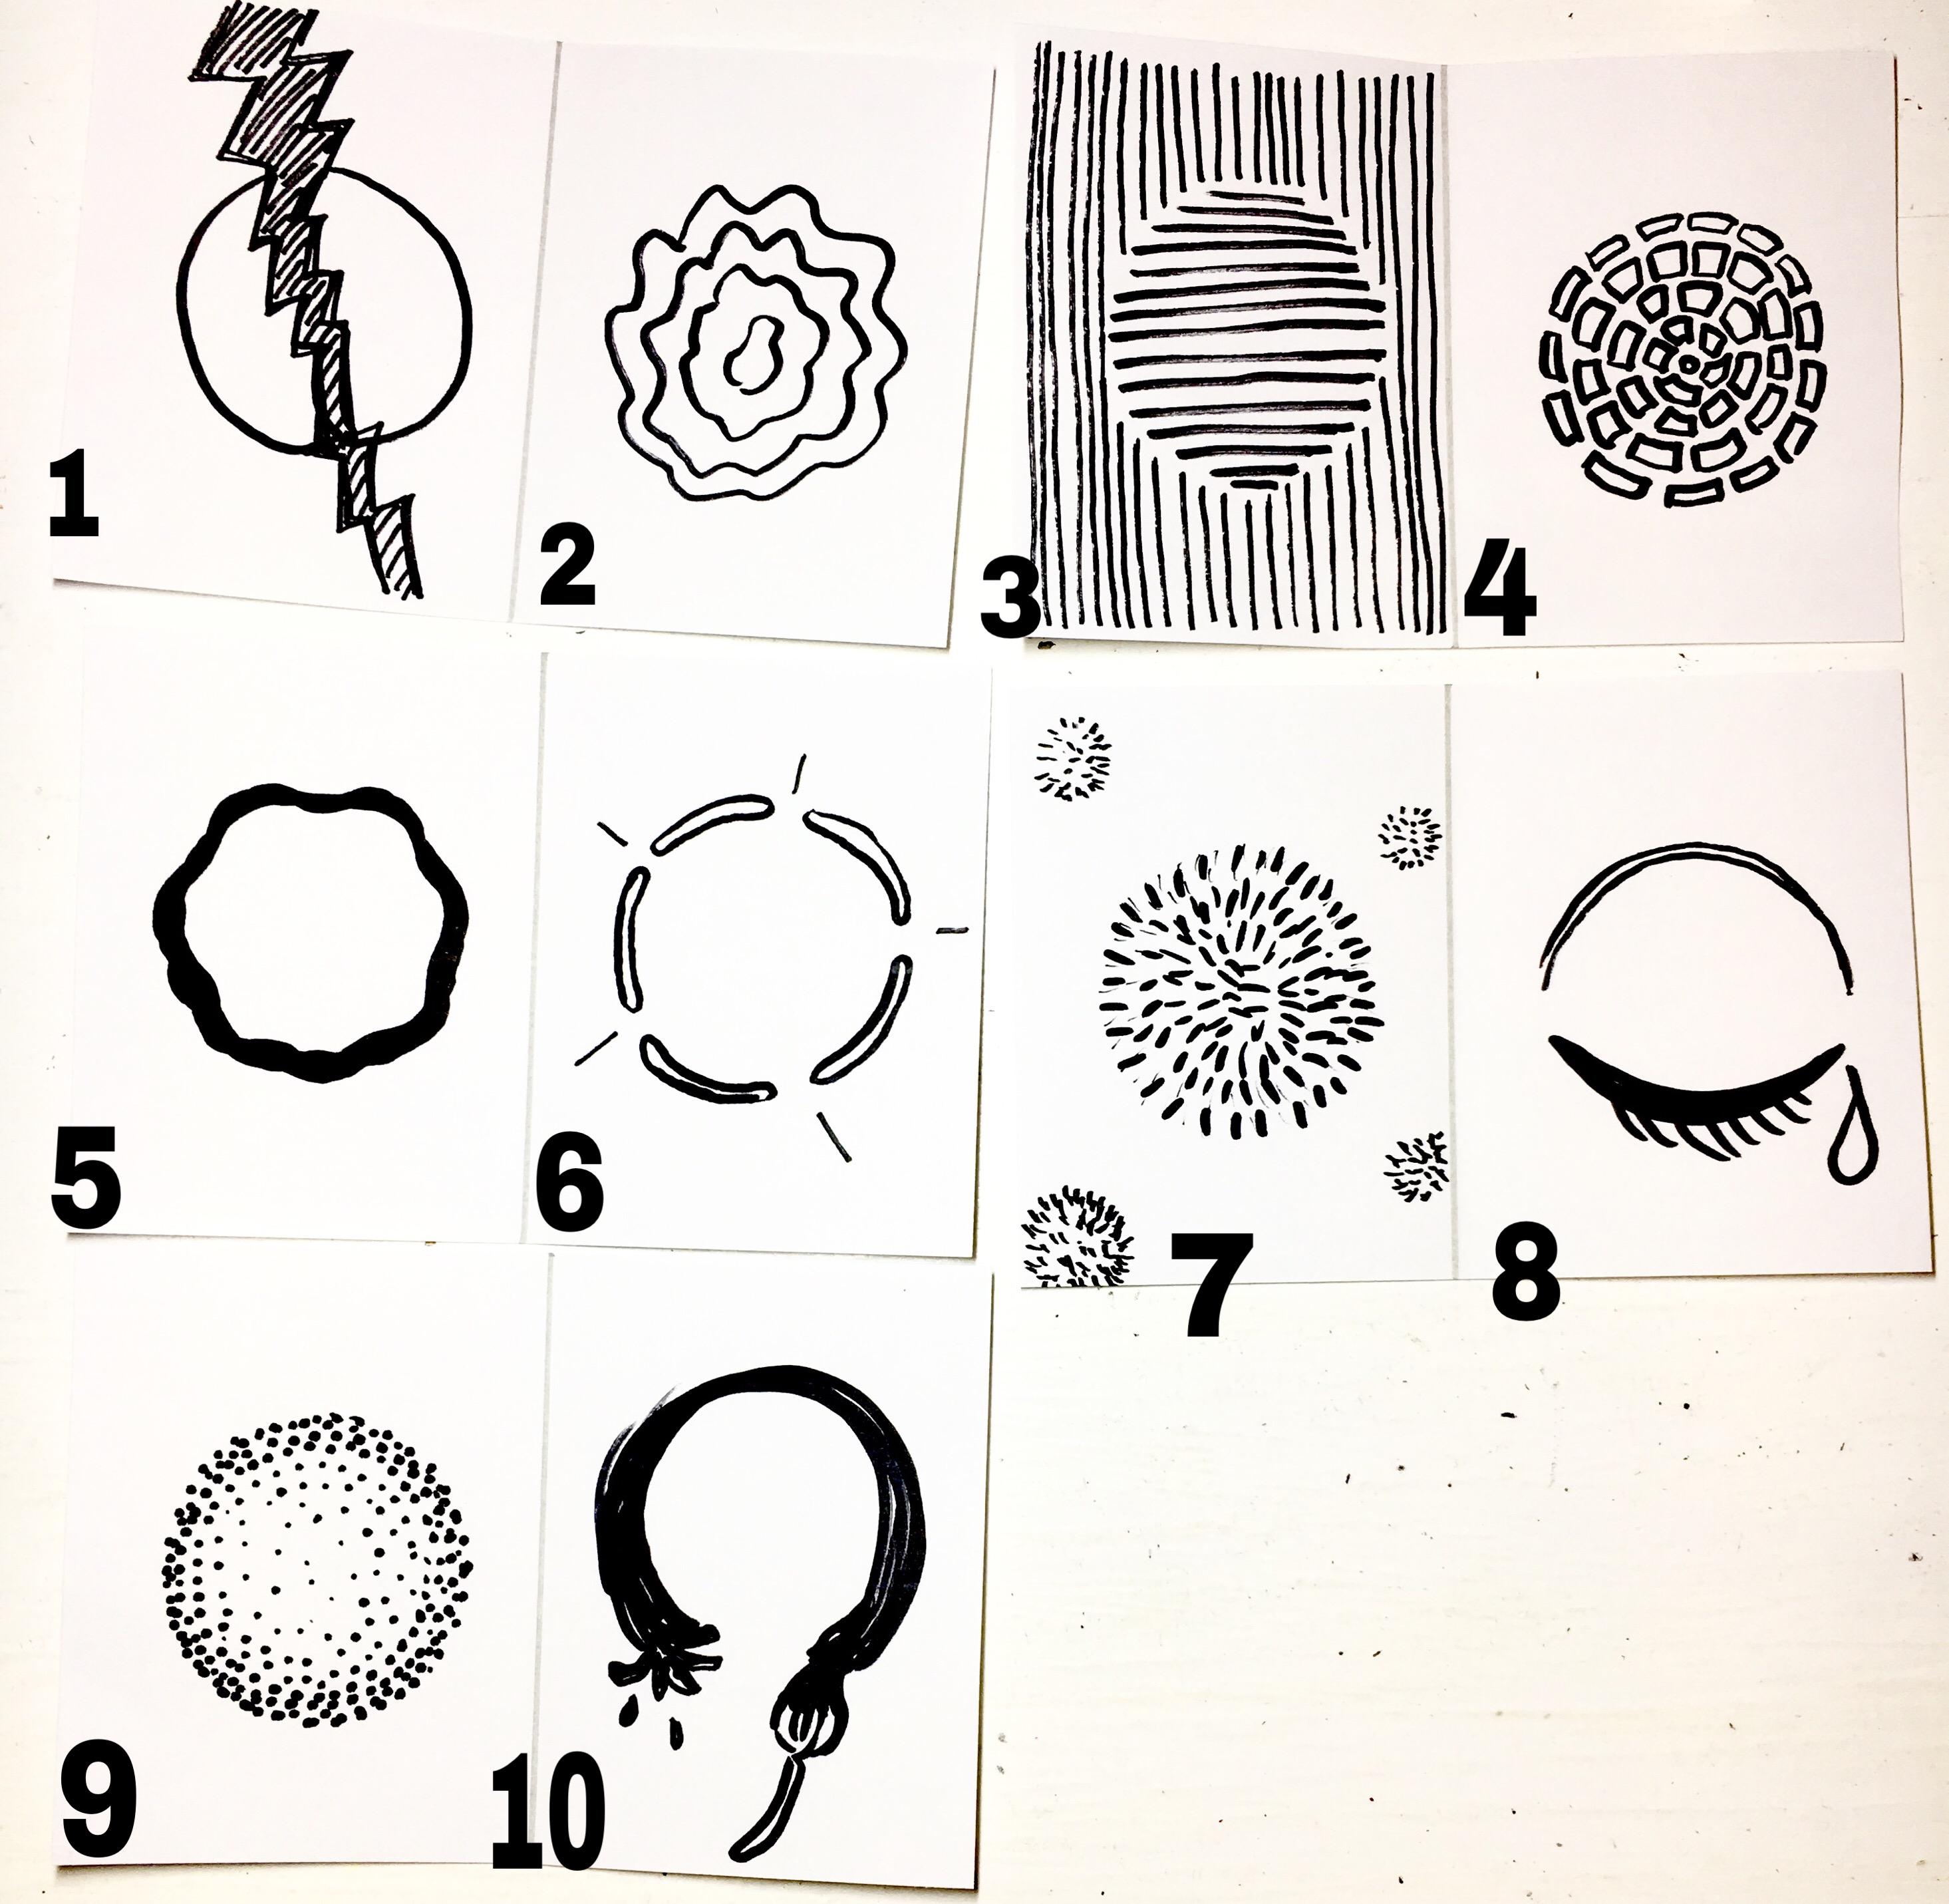 Noriko Fujiwara / Assignment #5